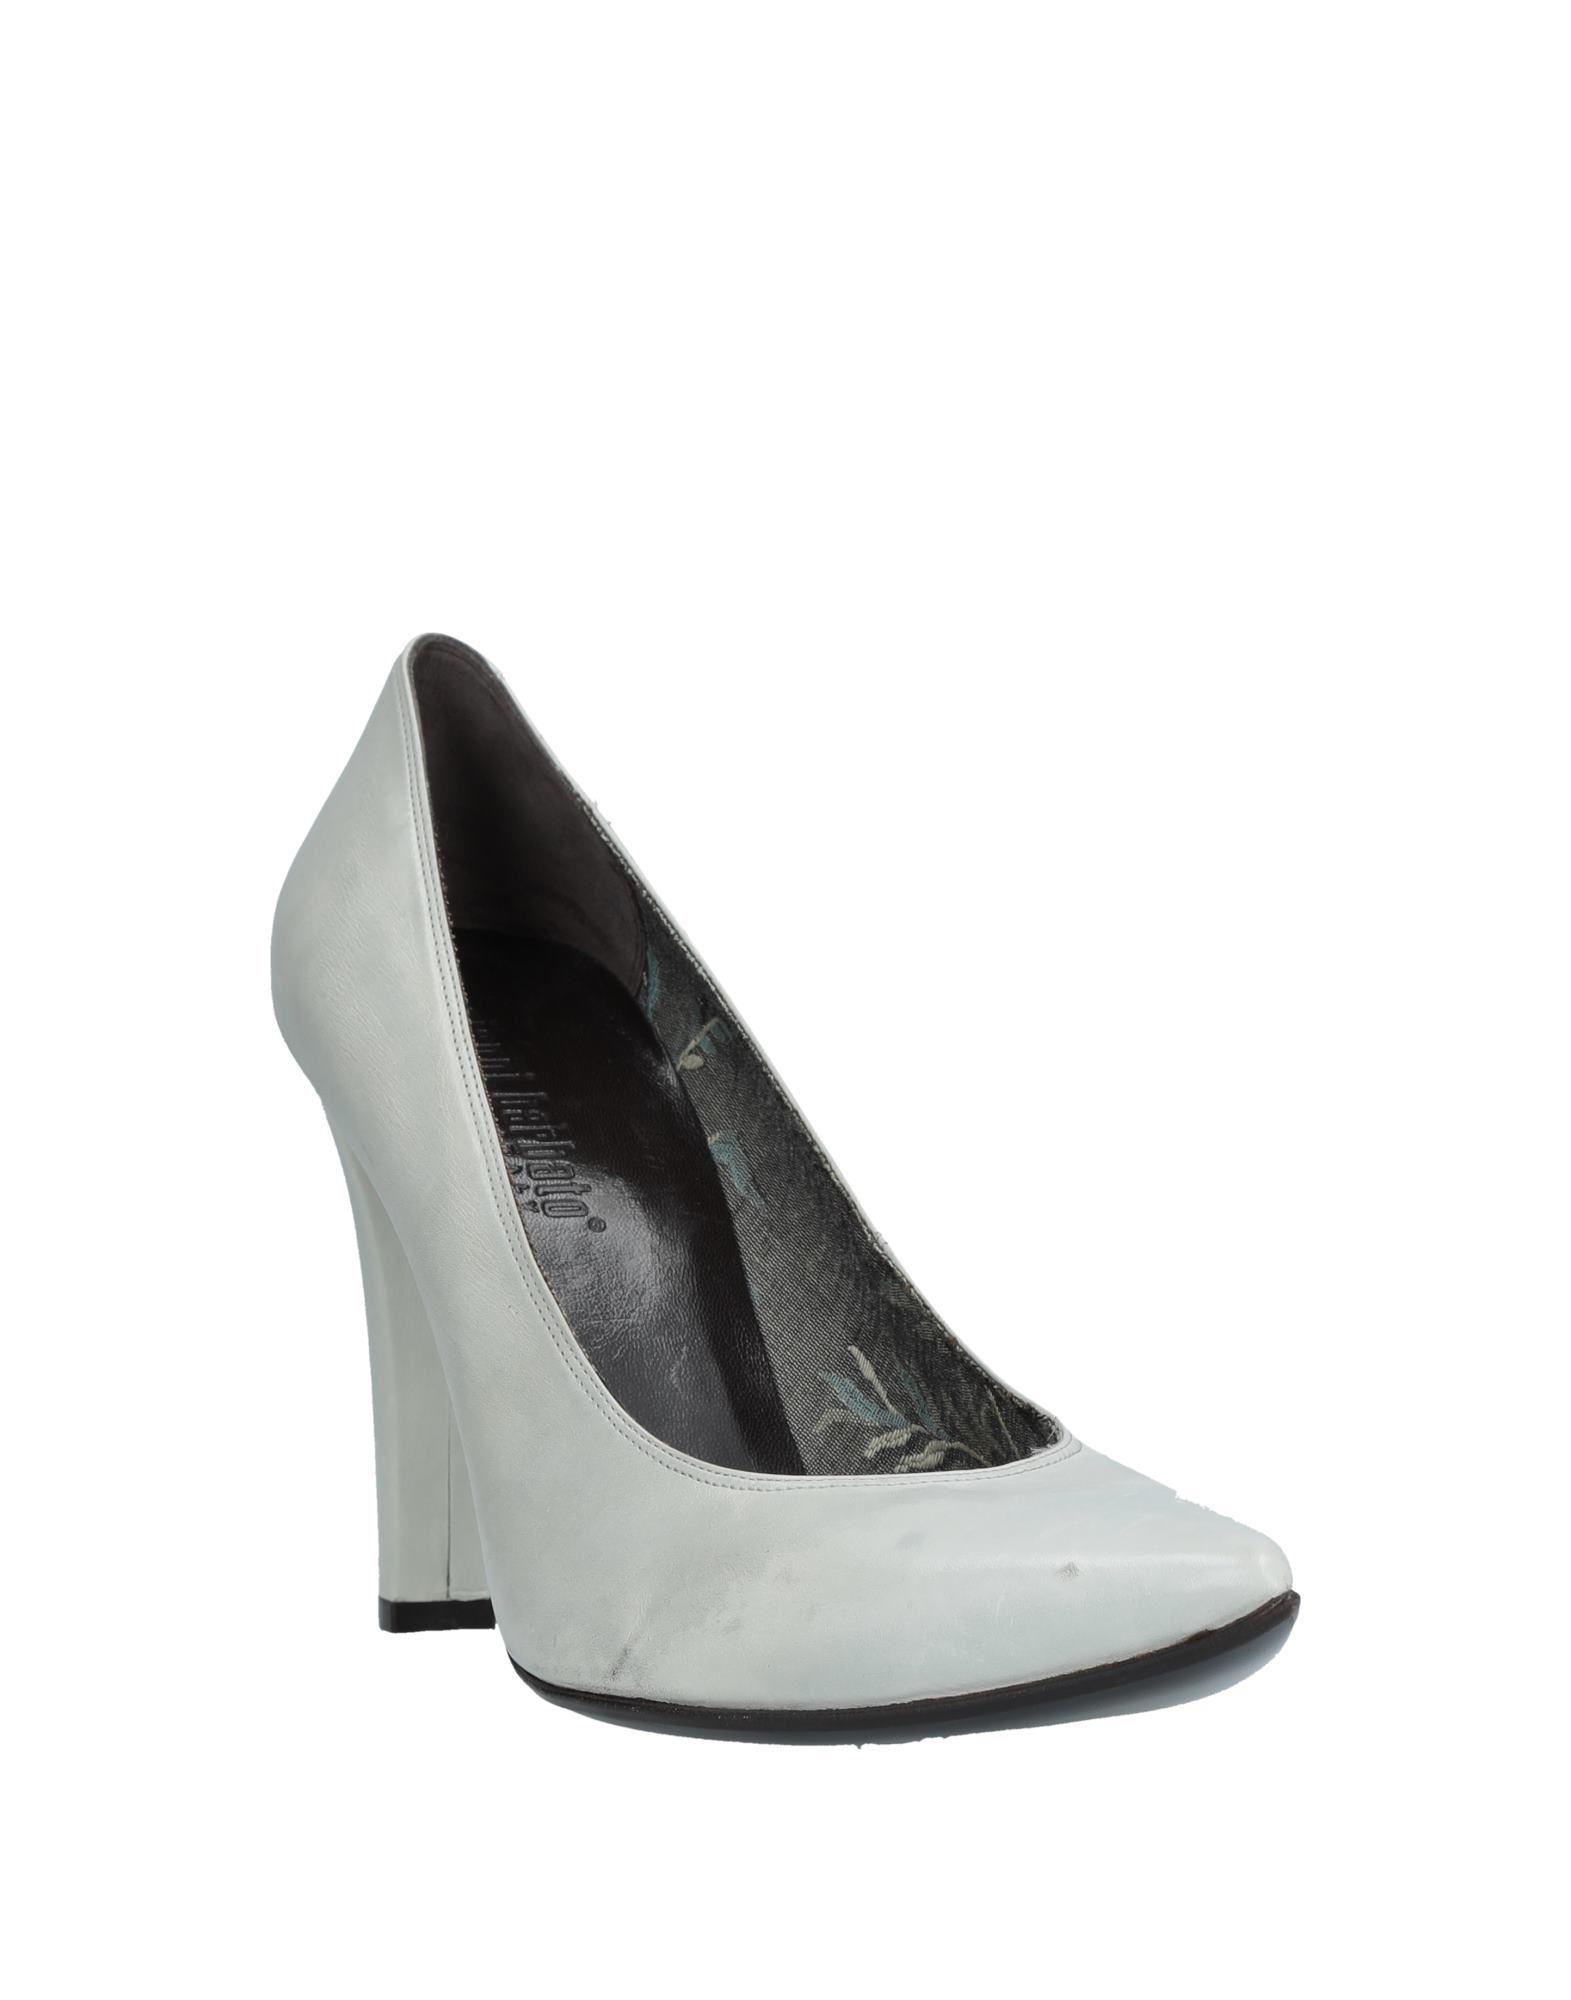 Stilvolle billige Schuhe Gianni Barbato 11533533VM Pumps Damen  11533533VM Barbato f26f38